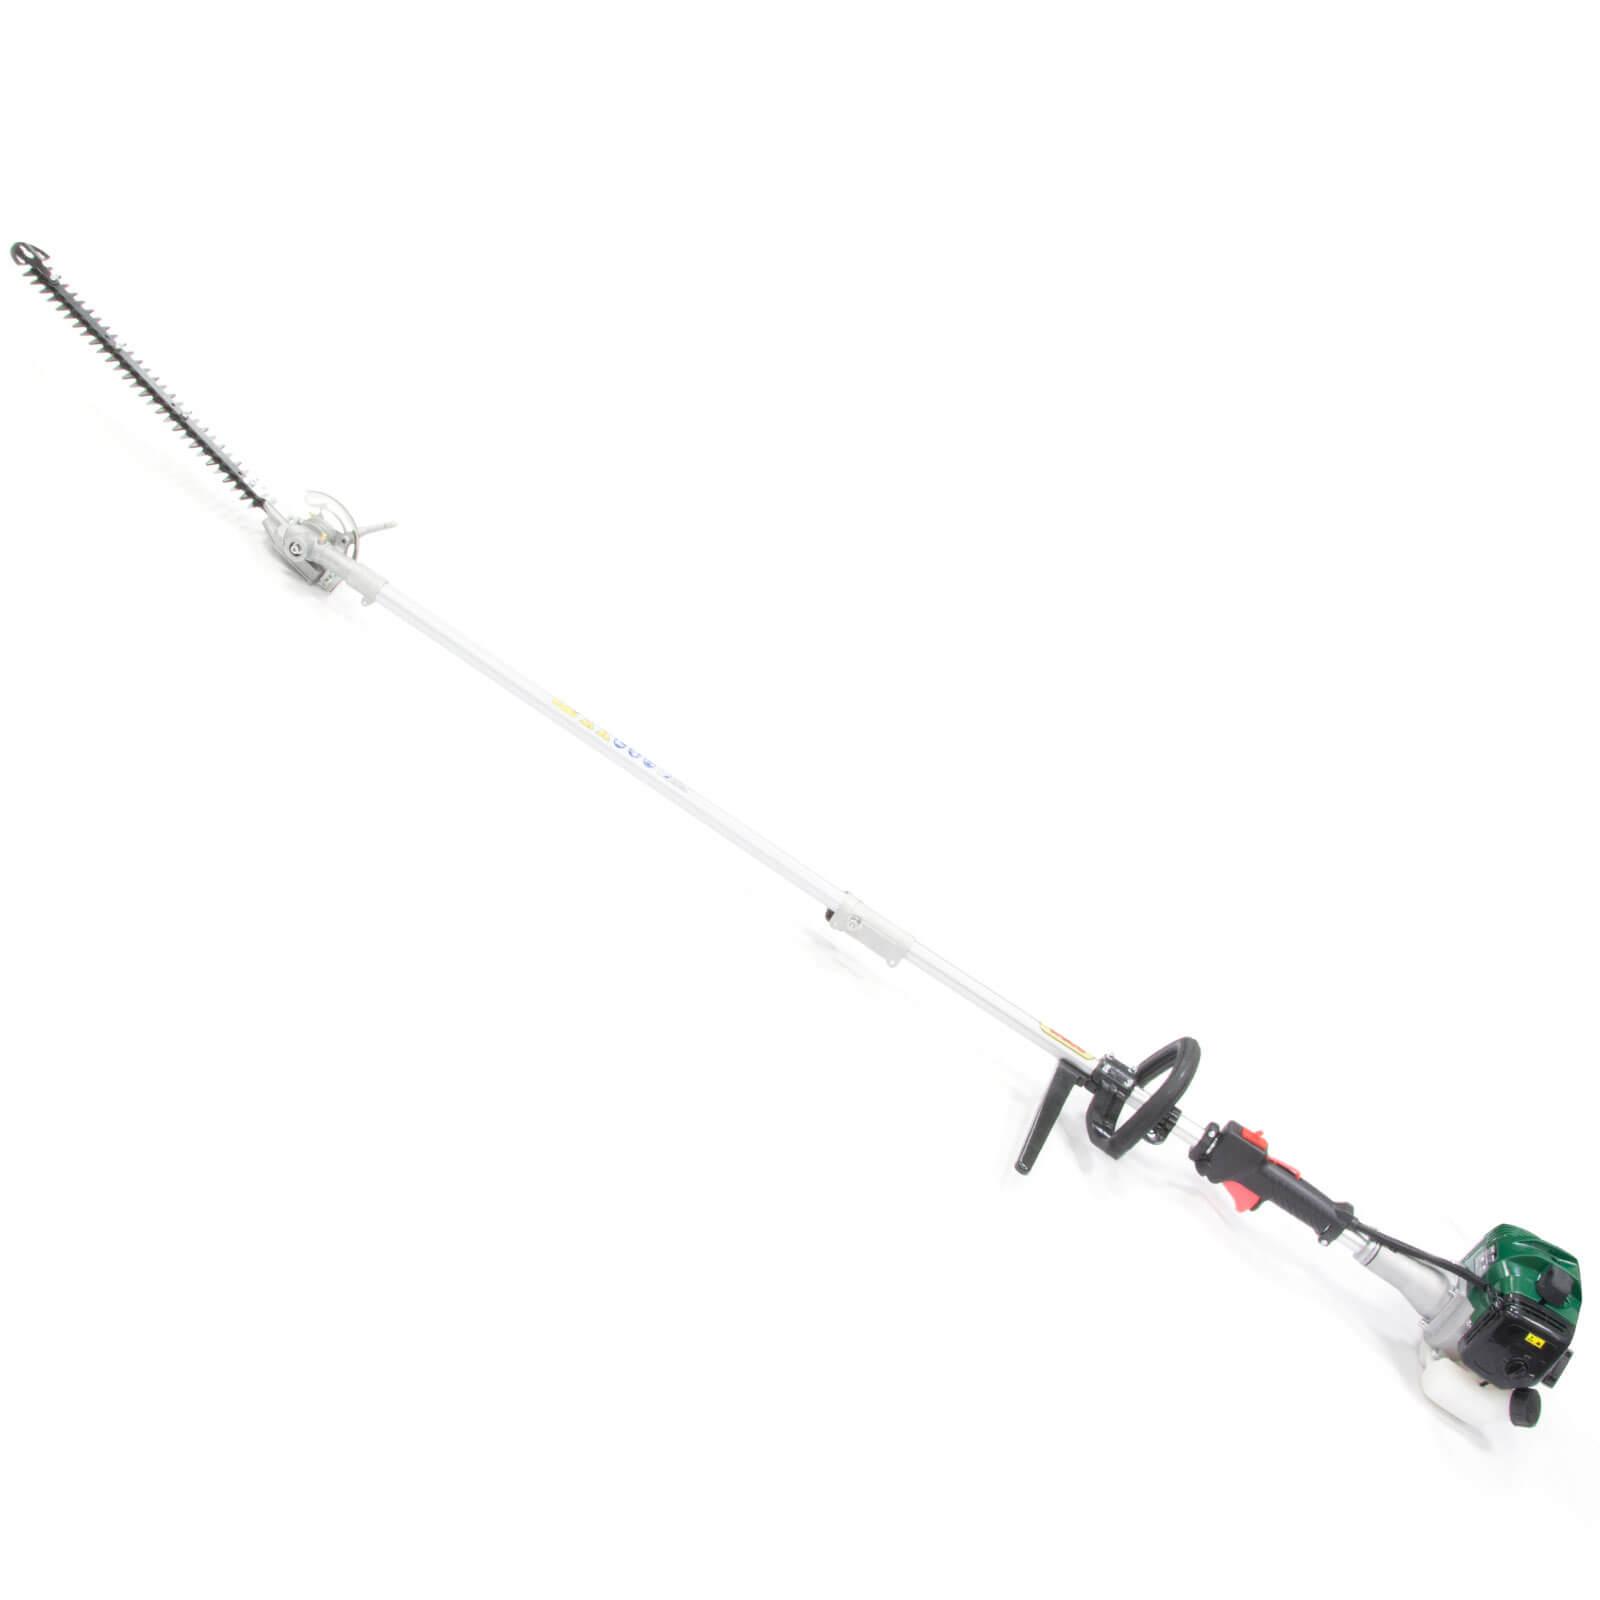 Webb WEPHT26 Split Shaft Long Petrol Hedge Trimmer 430mm